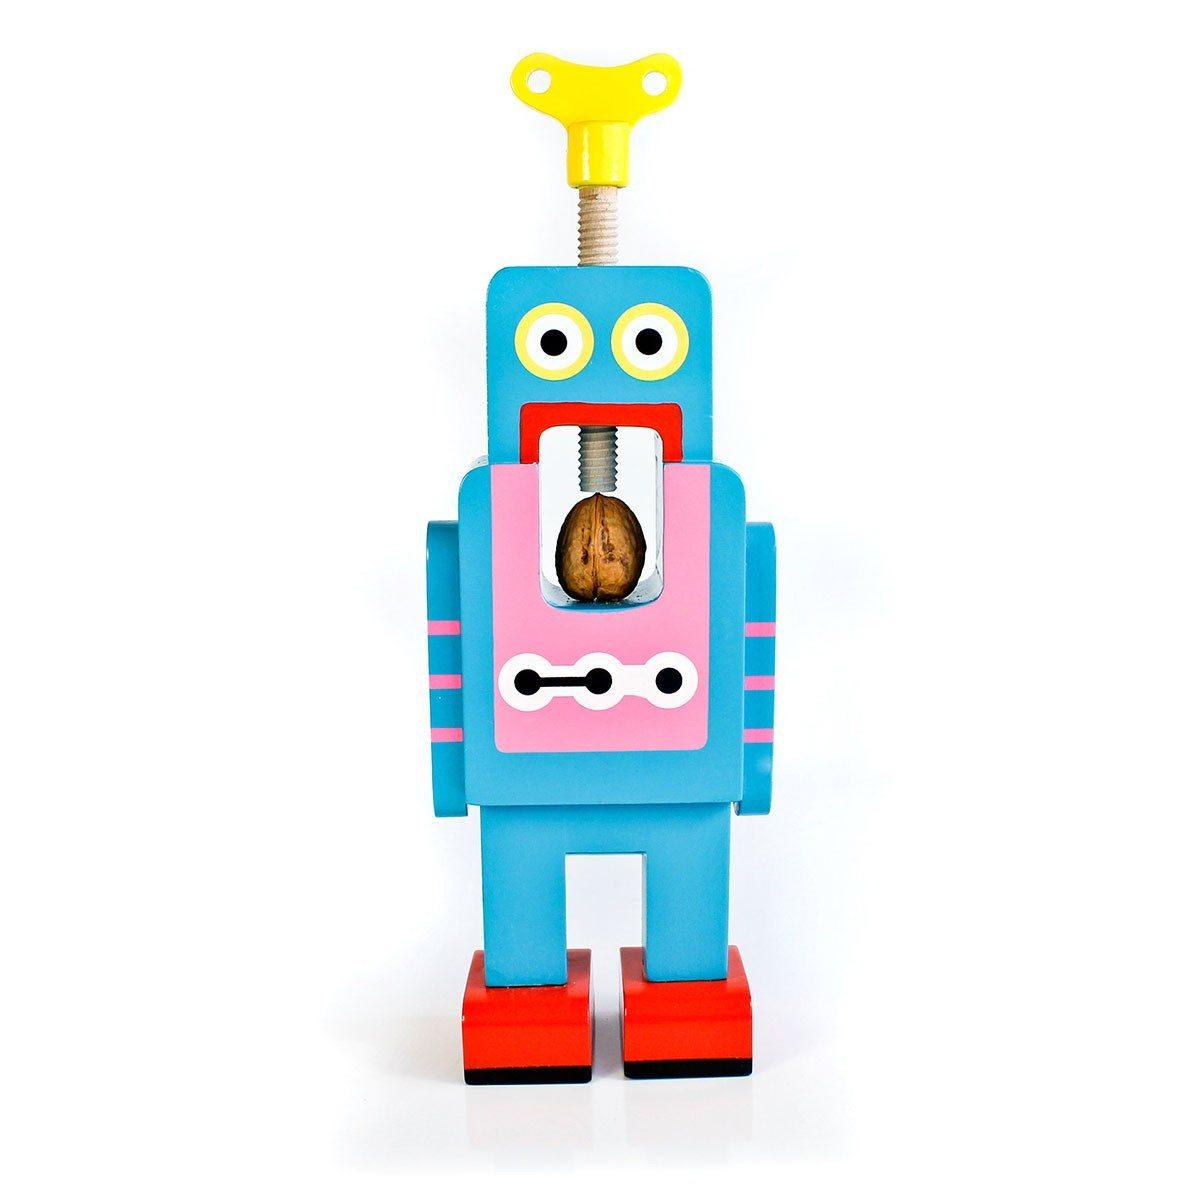 Robo – de notenkraker